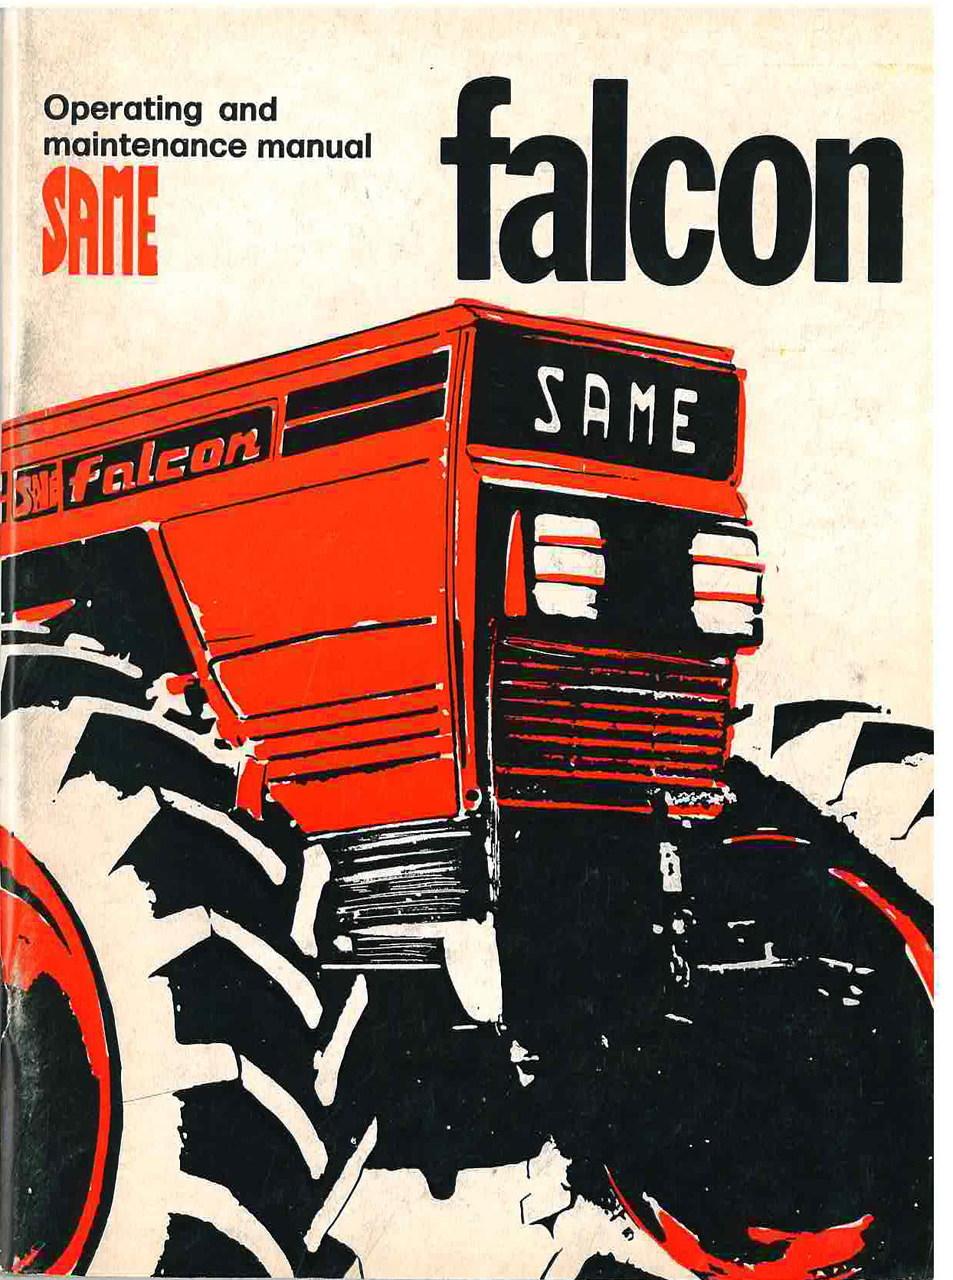 sdf archivio storico e museo rh archiviostorico sdfgroup com Tractor ManualsOnline International Tractor Manual